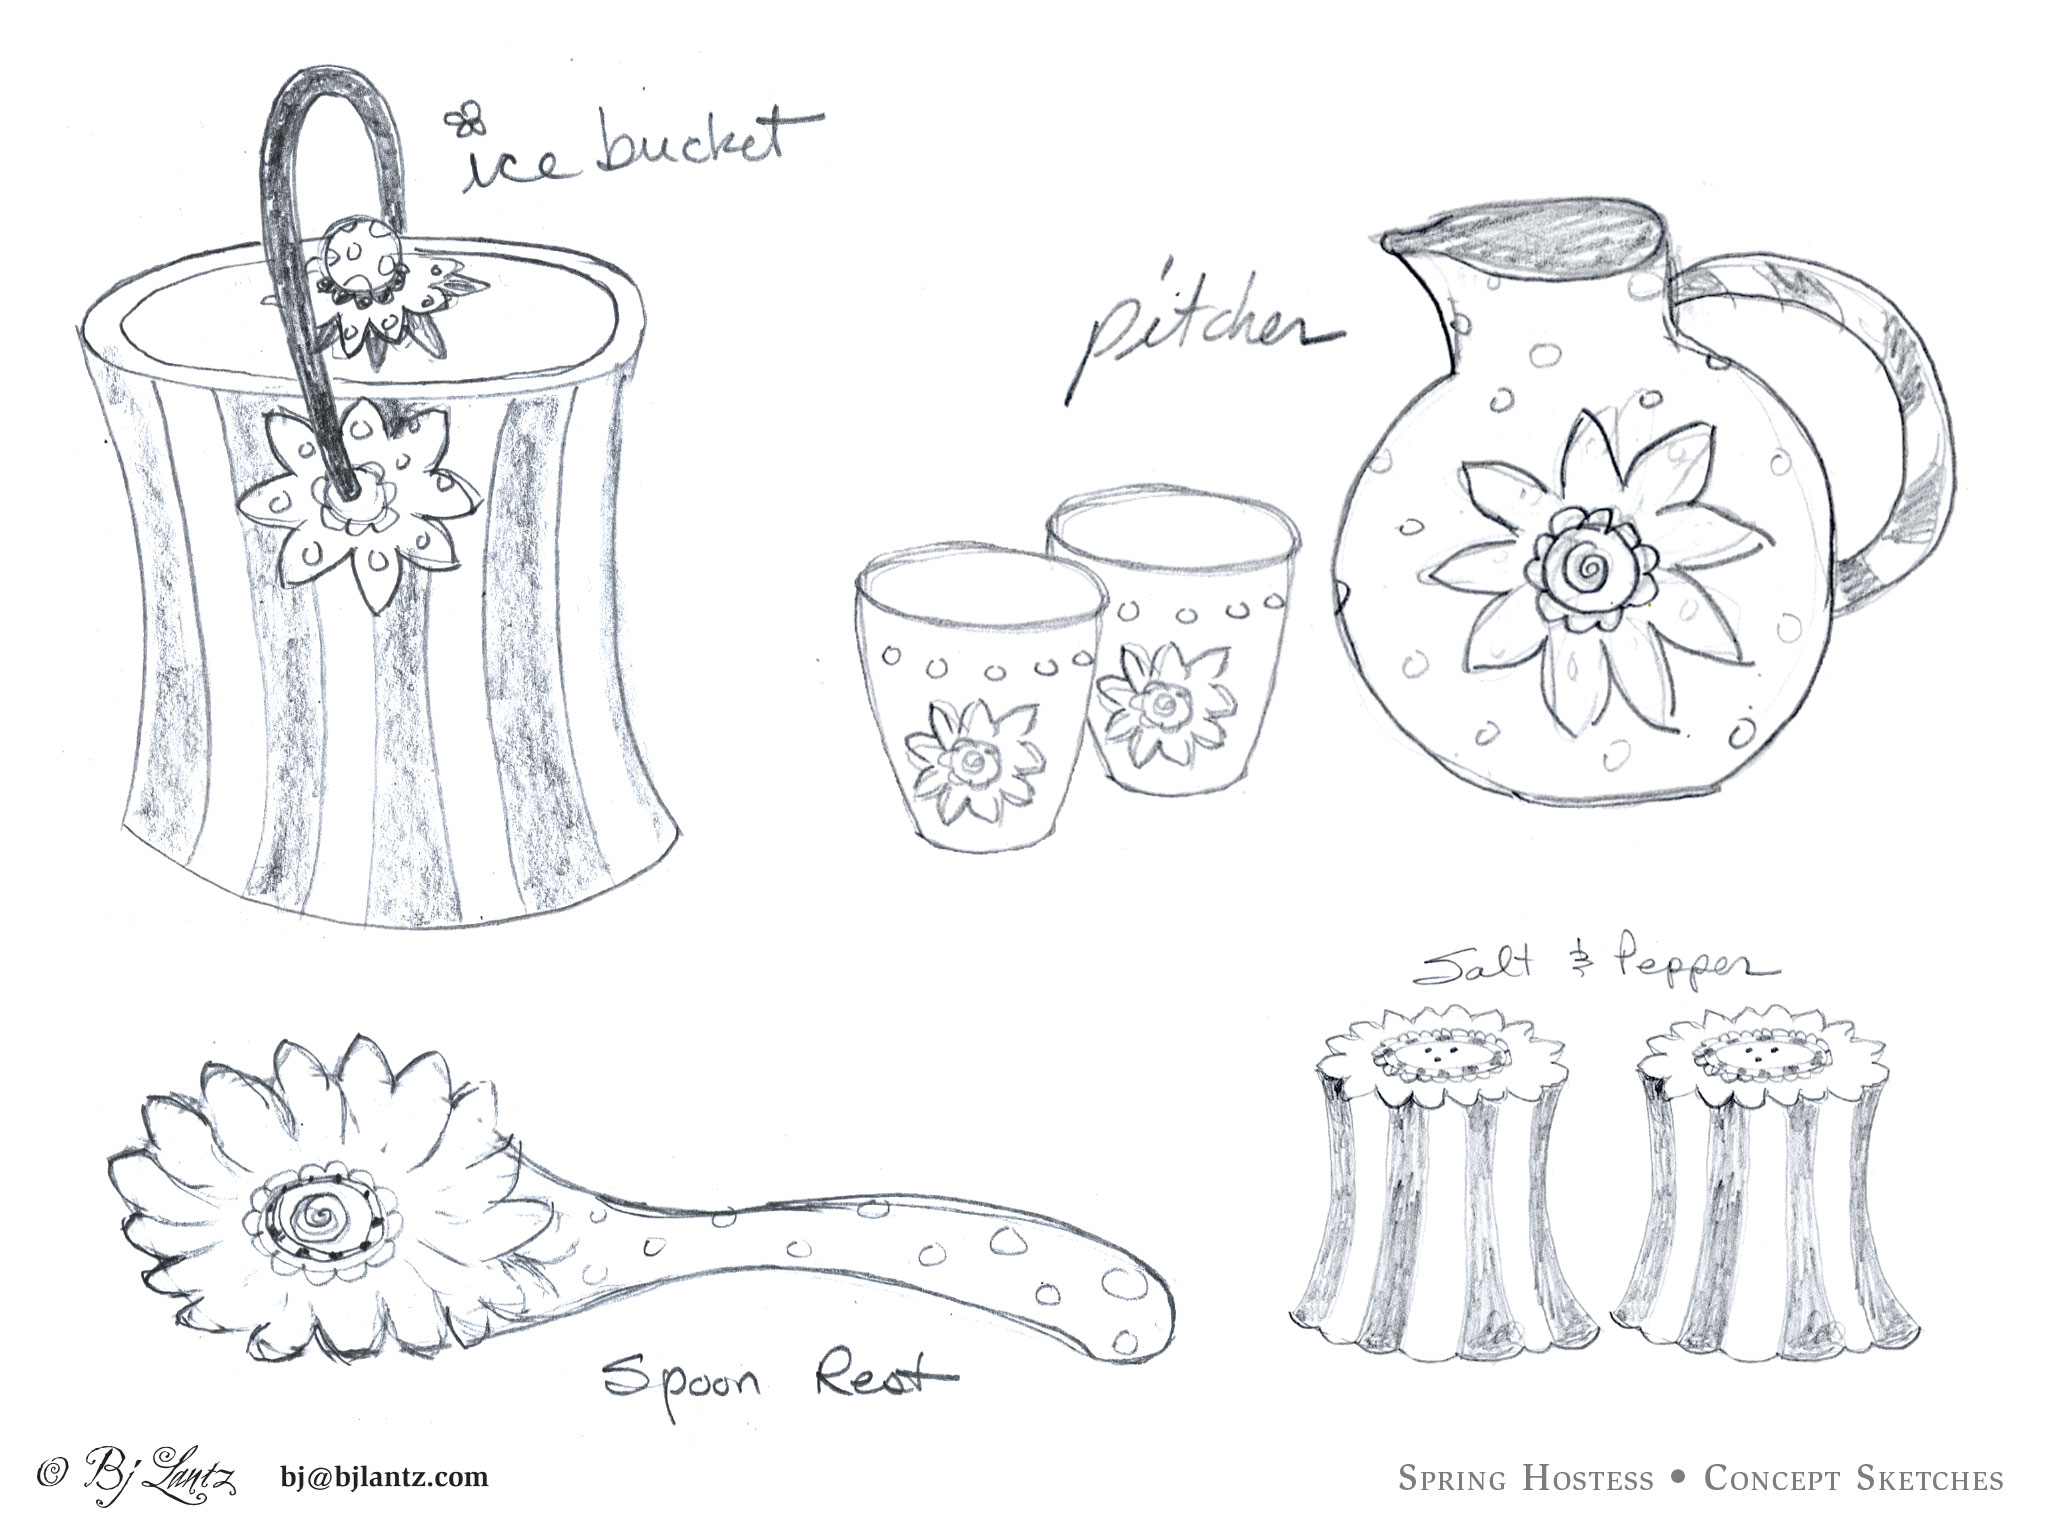 SprngHostess_Sketches_1_portfolio.jpg